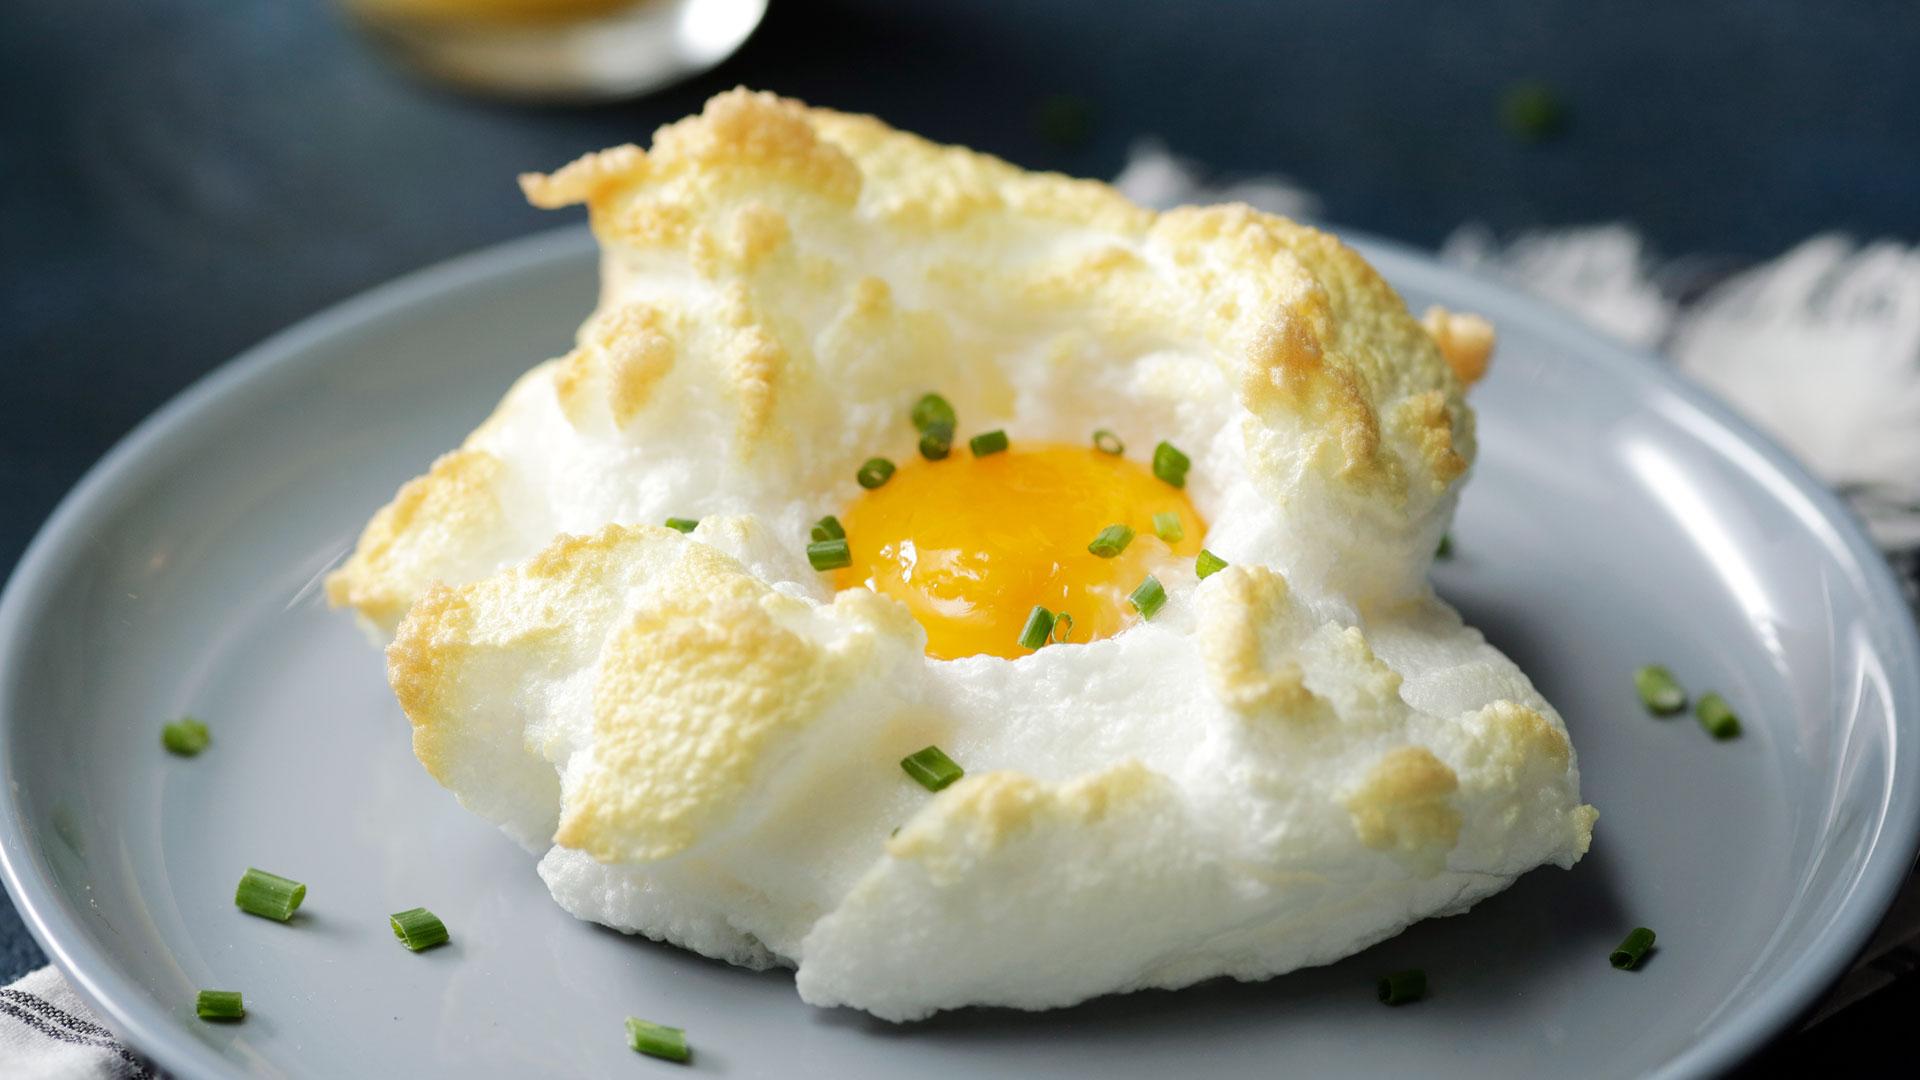 yumurta tarifleri